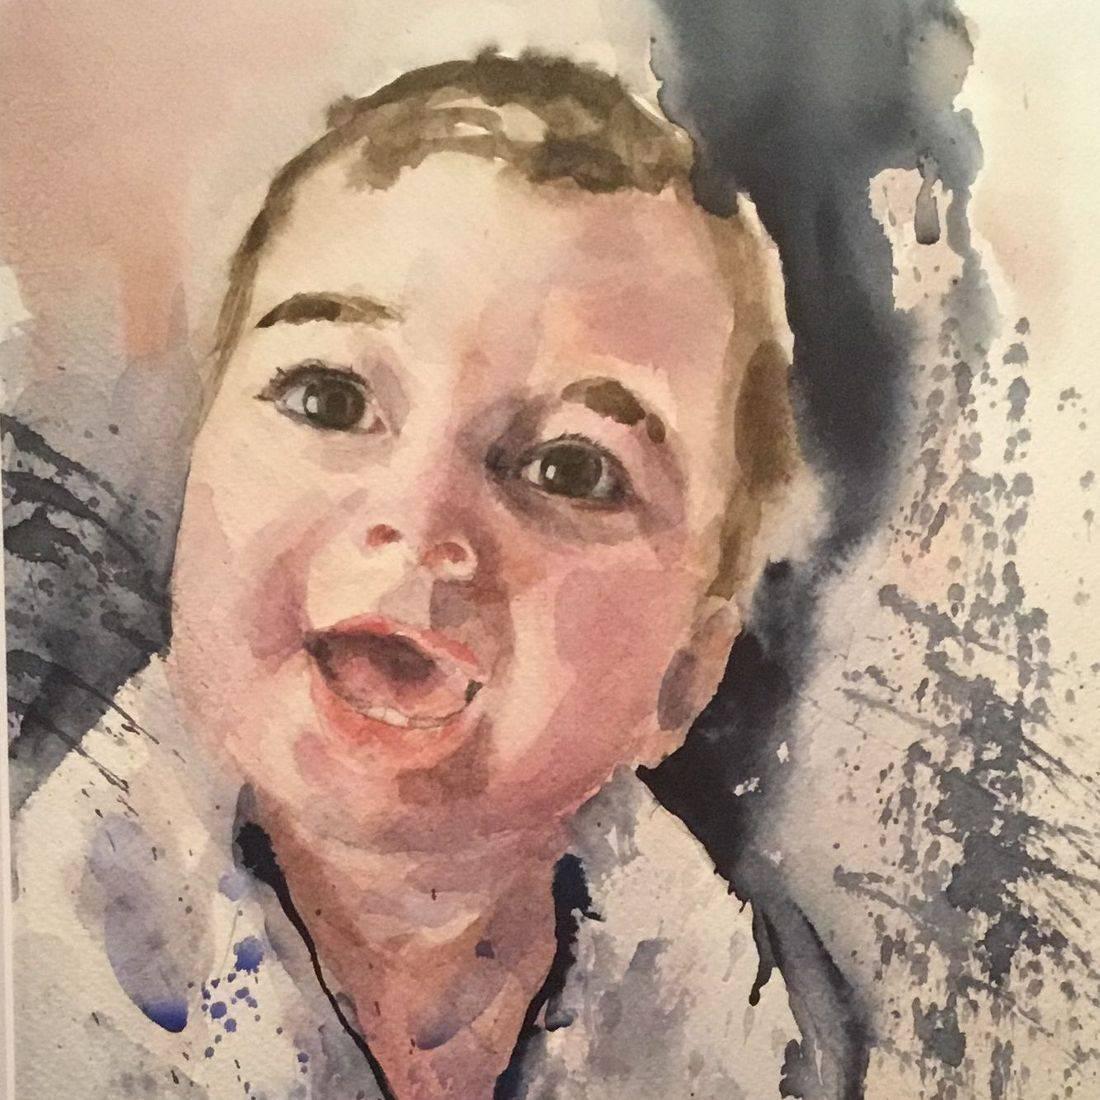 R Putbrese watercolor portrait of priest by Rebecca Krutsinger